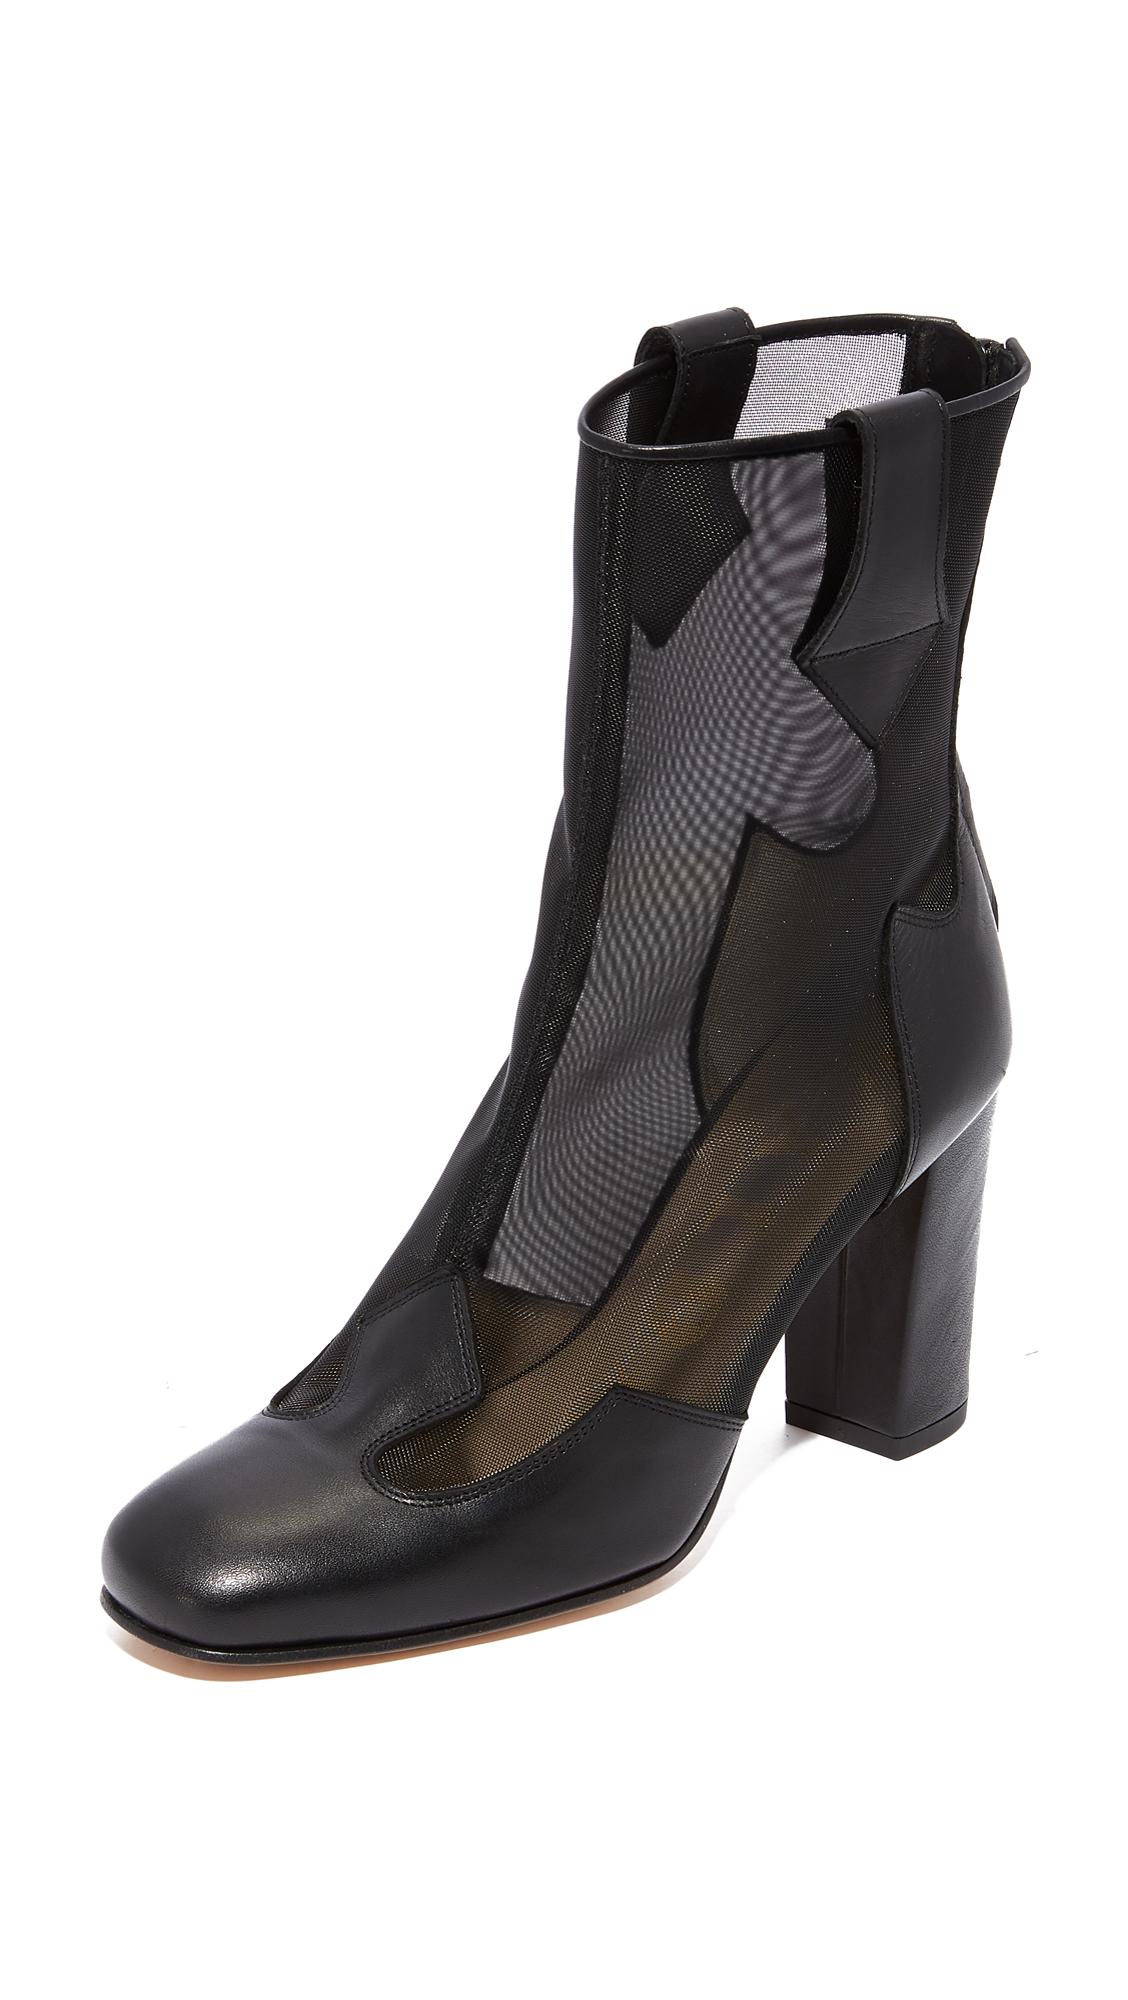 Kalda Lou Boots - Black